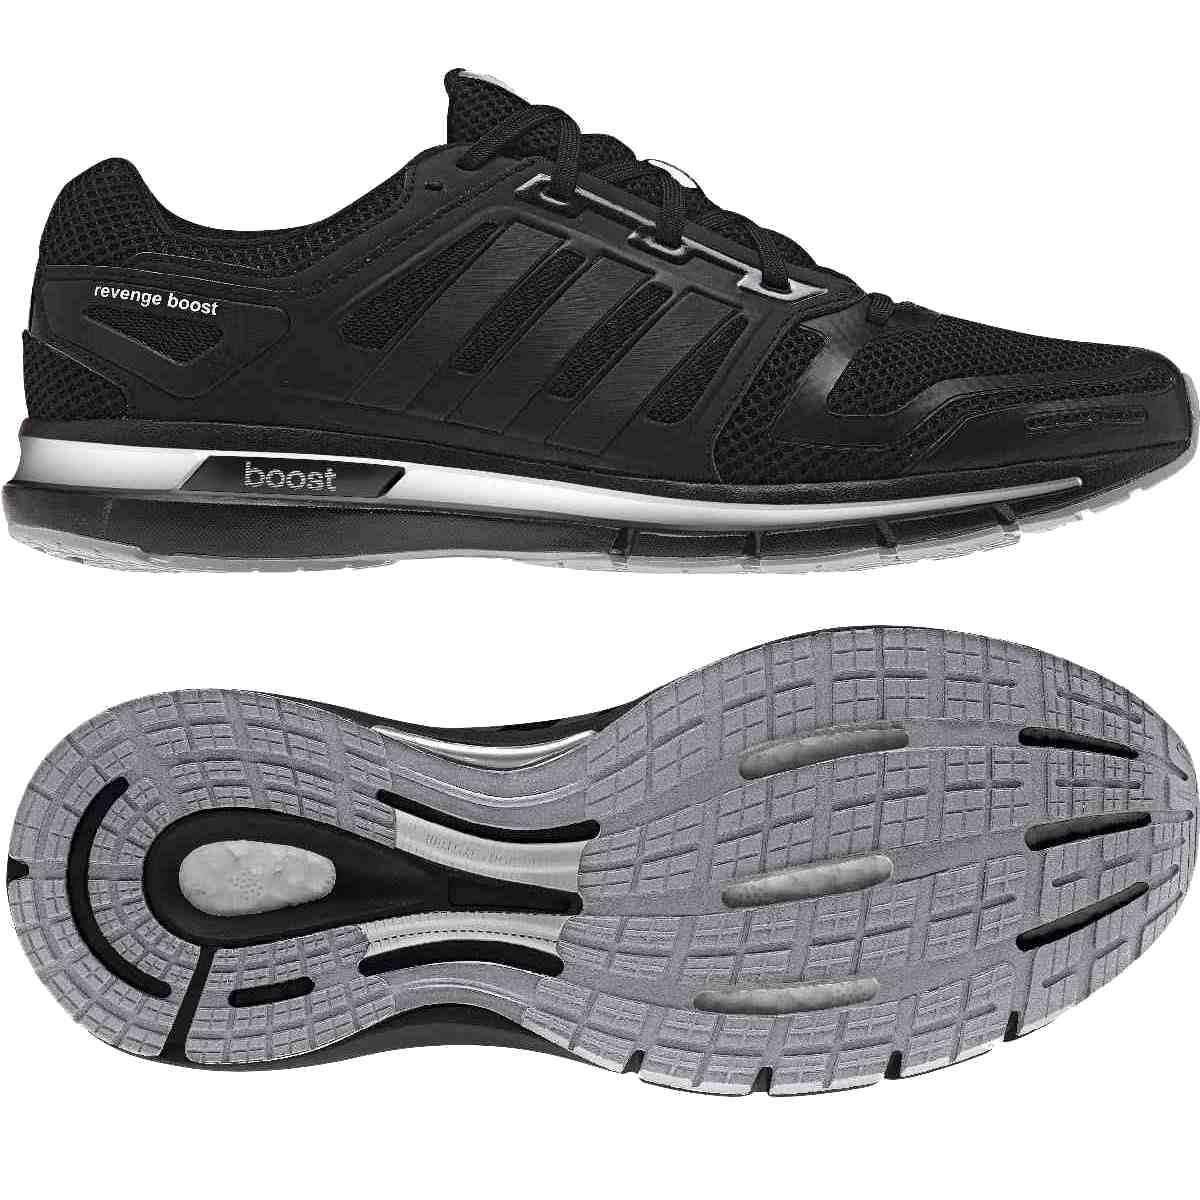 adidas revenge boost schuhe laufschuhe joggingschuhe sportschuhe herren ebay. Black Bedroom Furniture Sets. Home Design Ideas